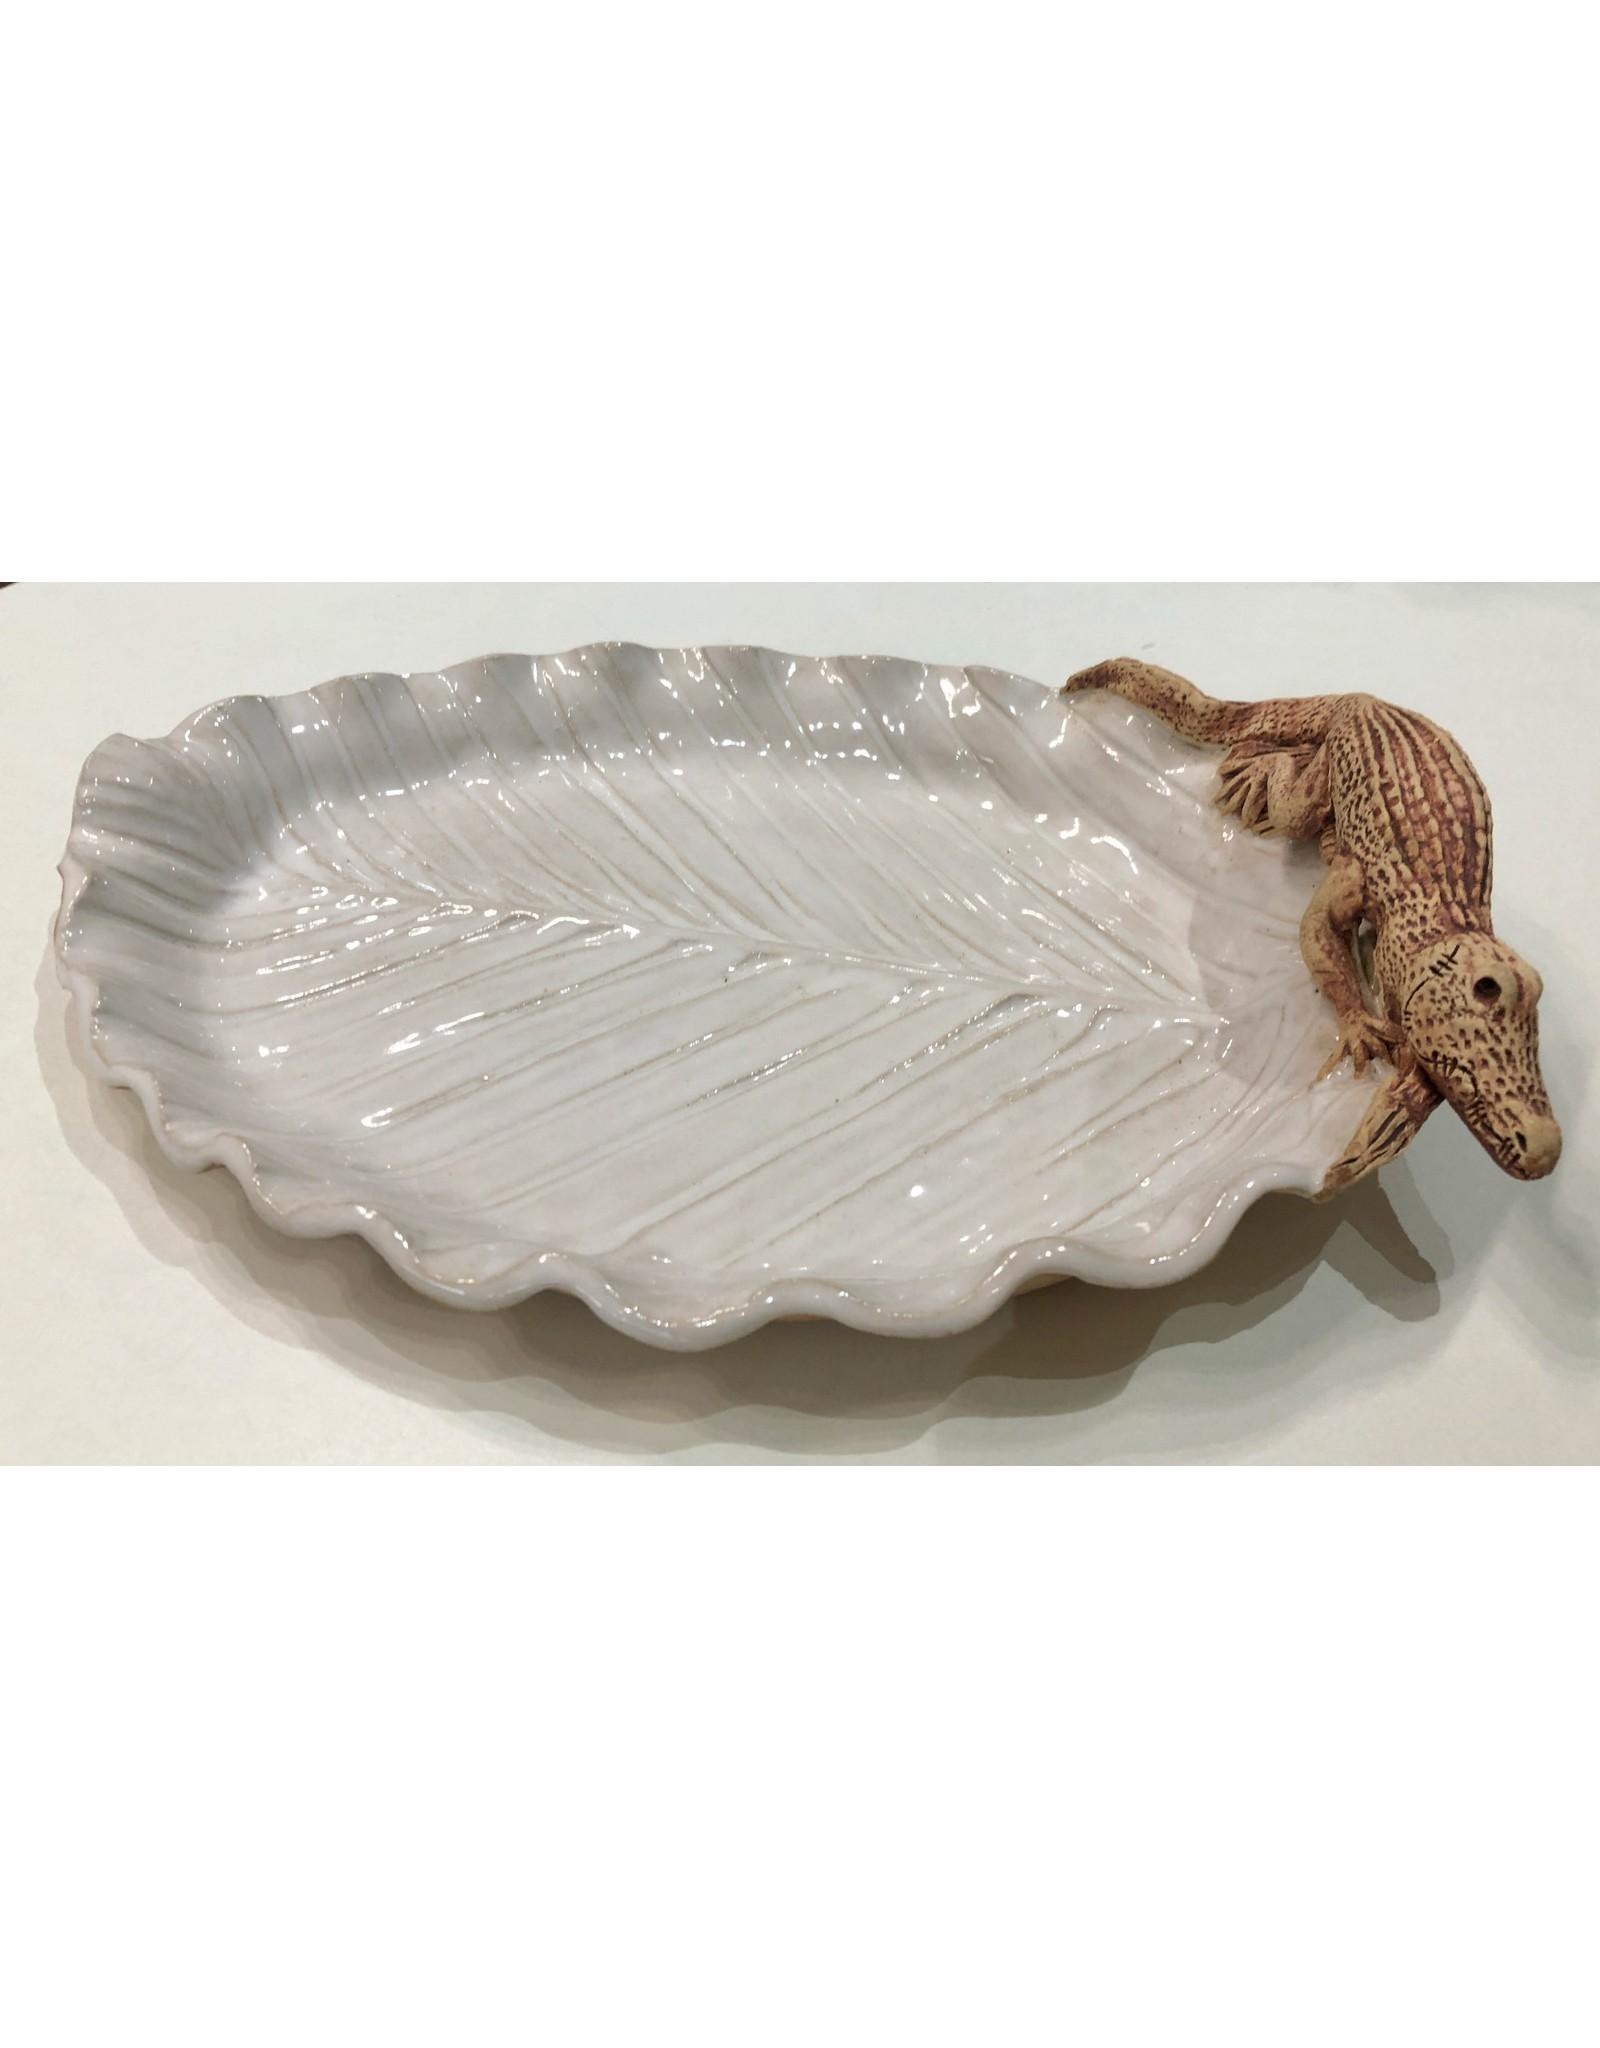 Charlestowne Porcelaine DISH (Palm Leaf, gator or shell, #216, CHAP)